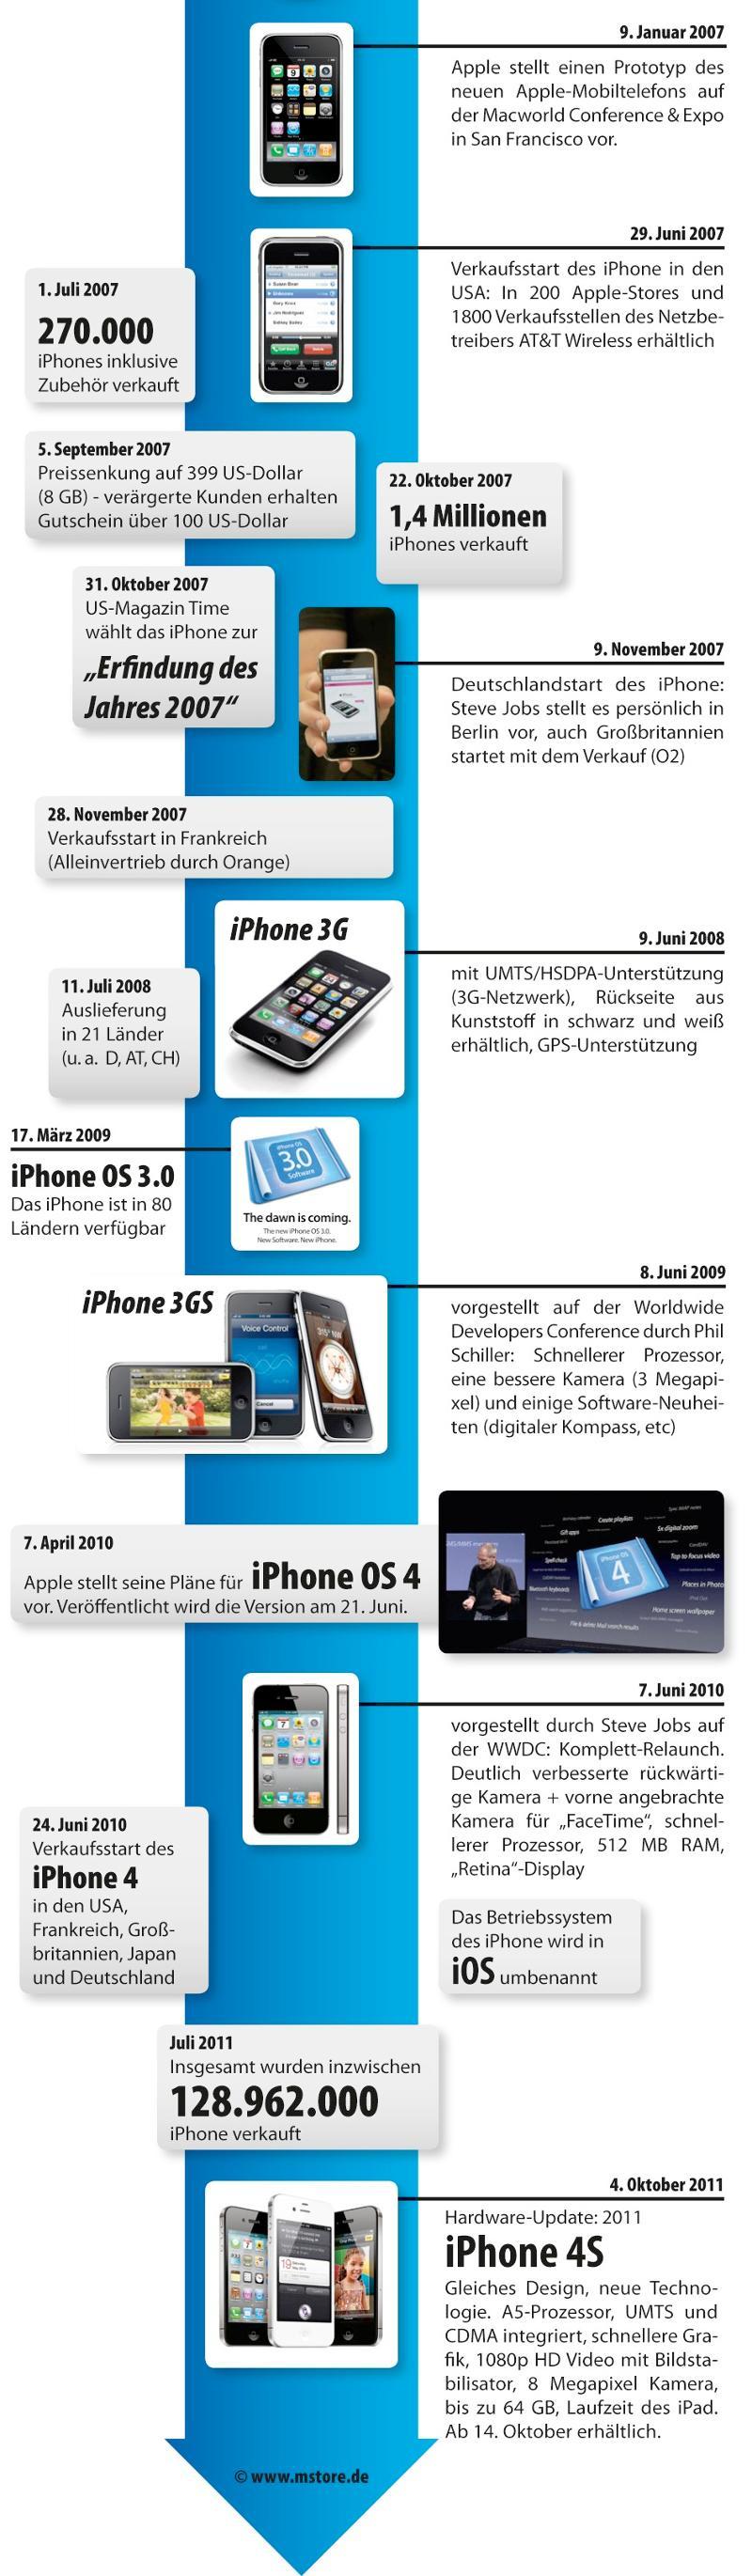 infografik_iphone-historie